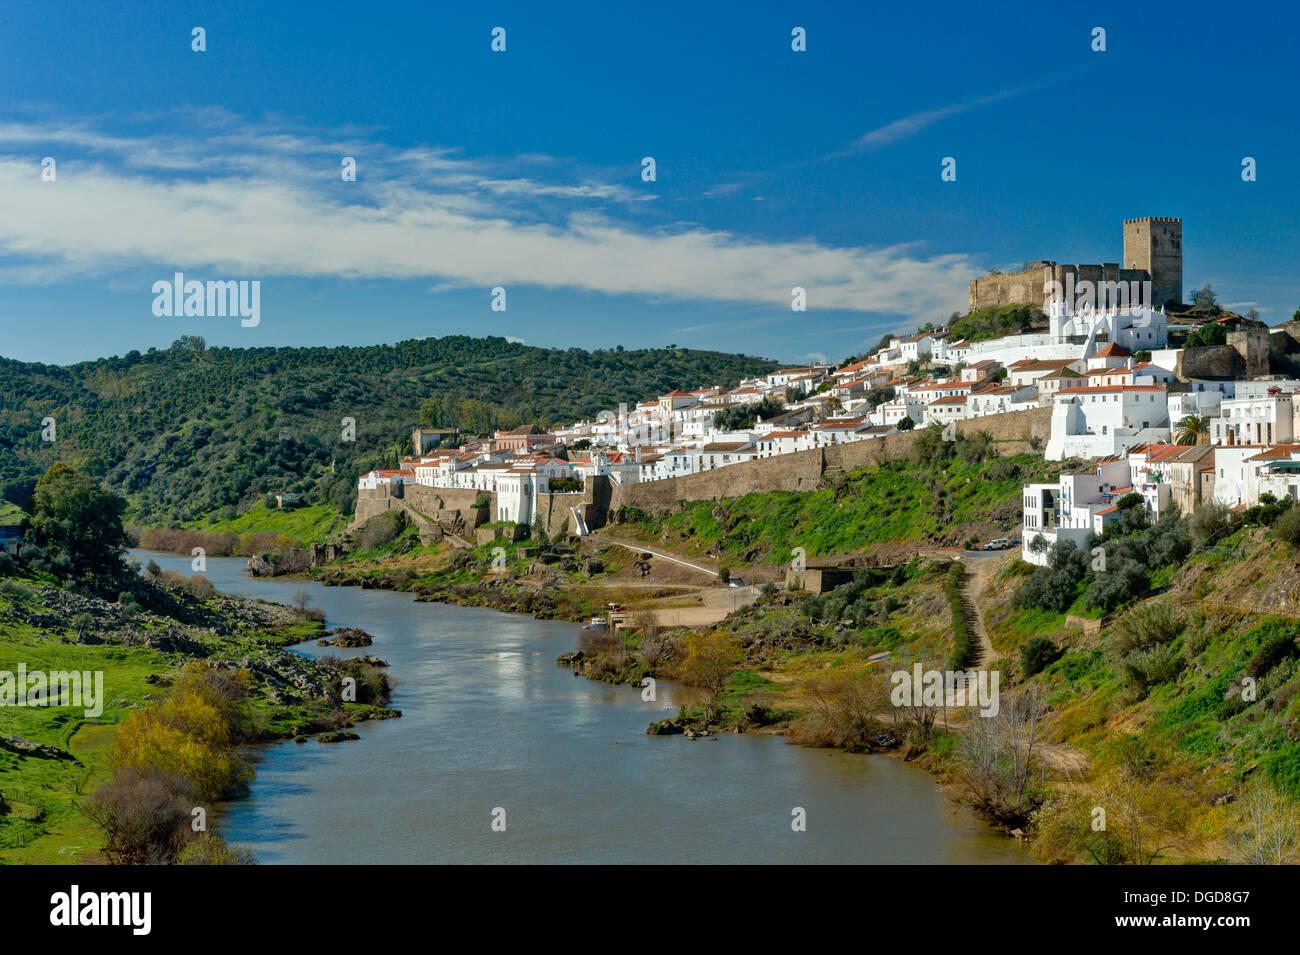 Portugal the Algarve Mértola the Alentejo Stock Photo: 61757703 - Alamy